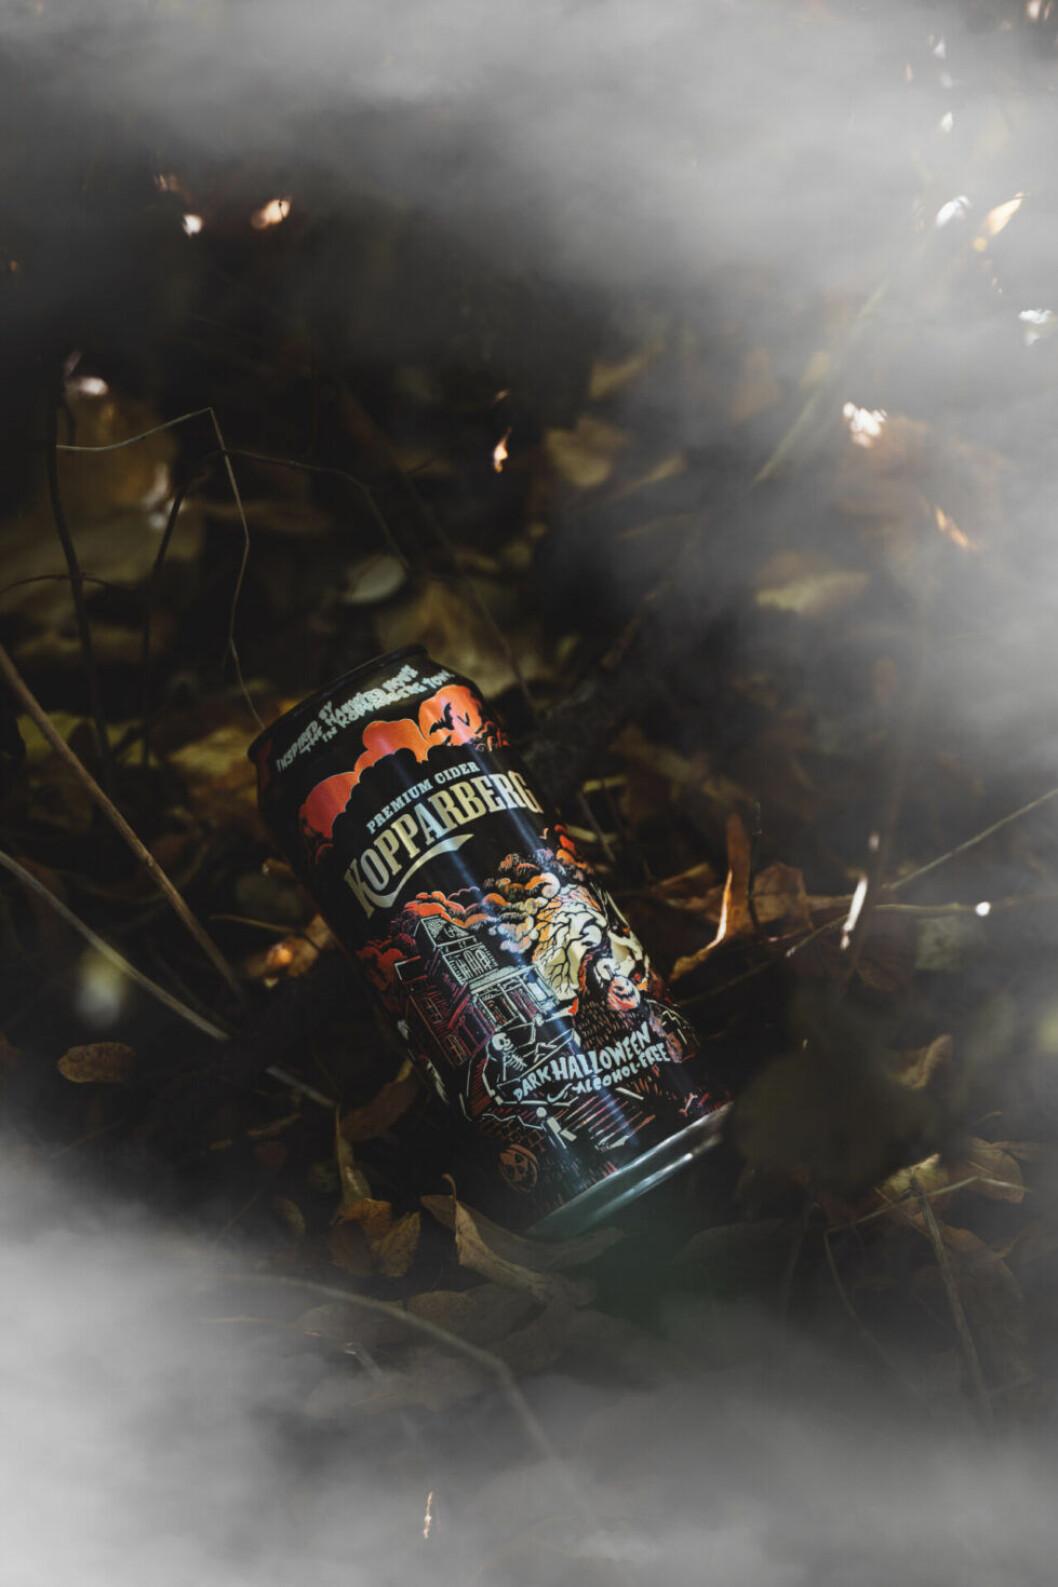 cider bland löv